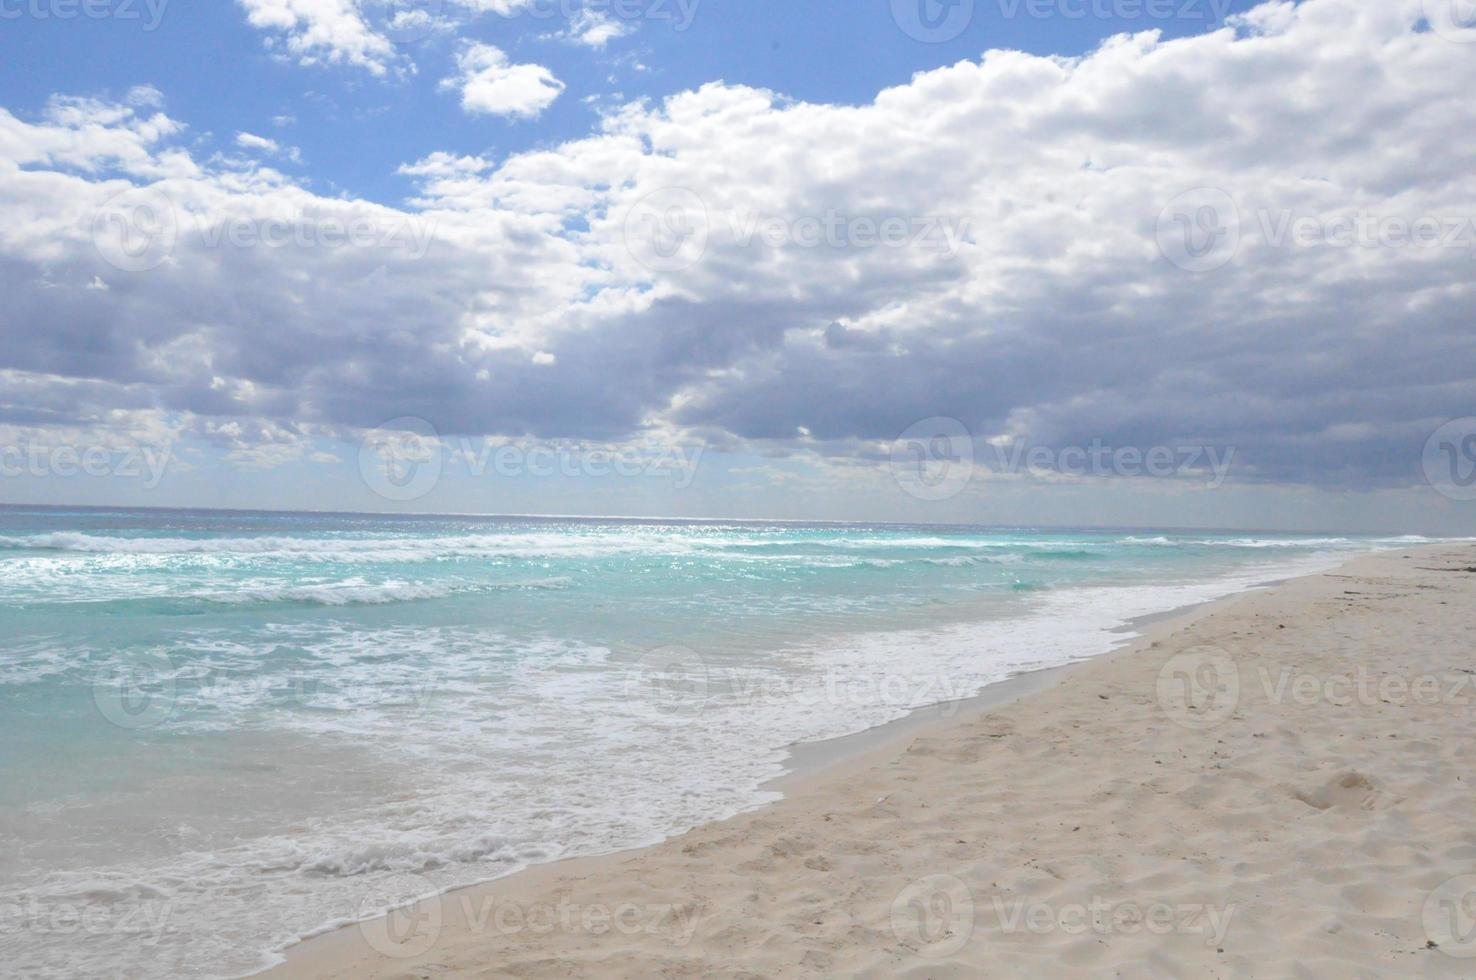 Beach in Cozumel, Mexico photo